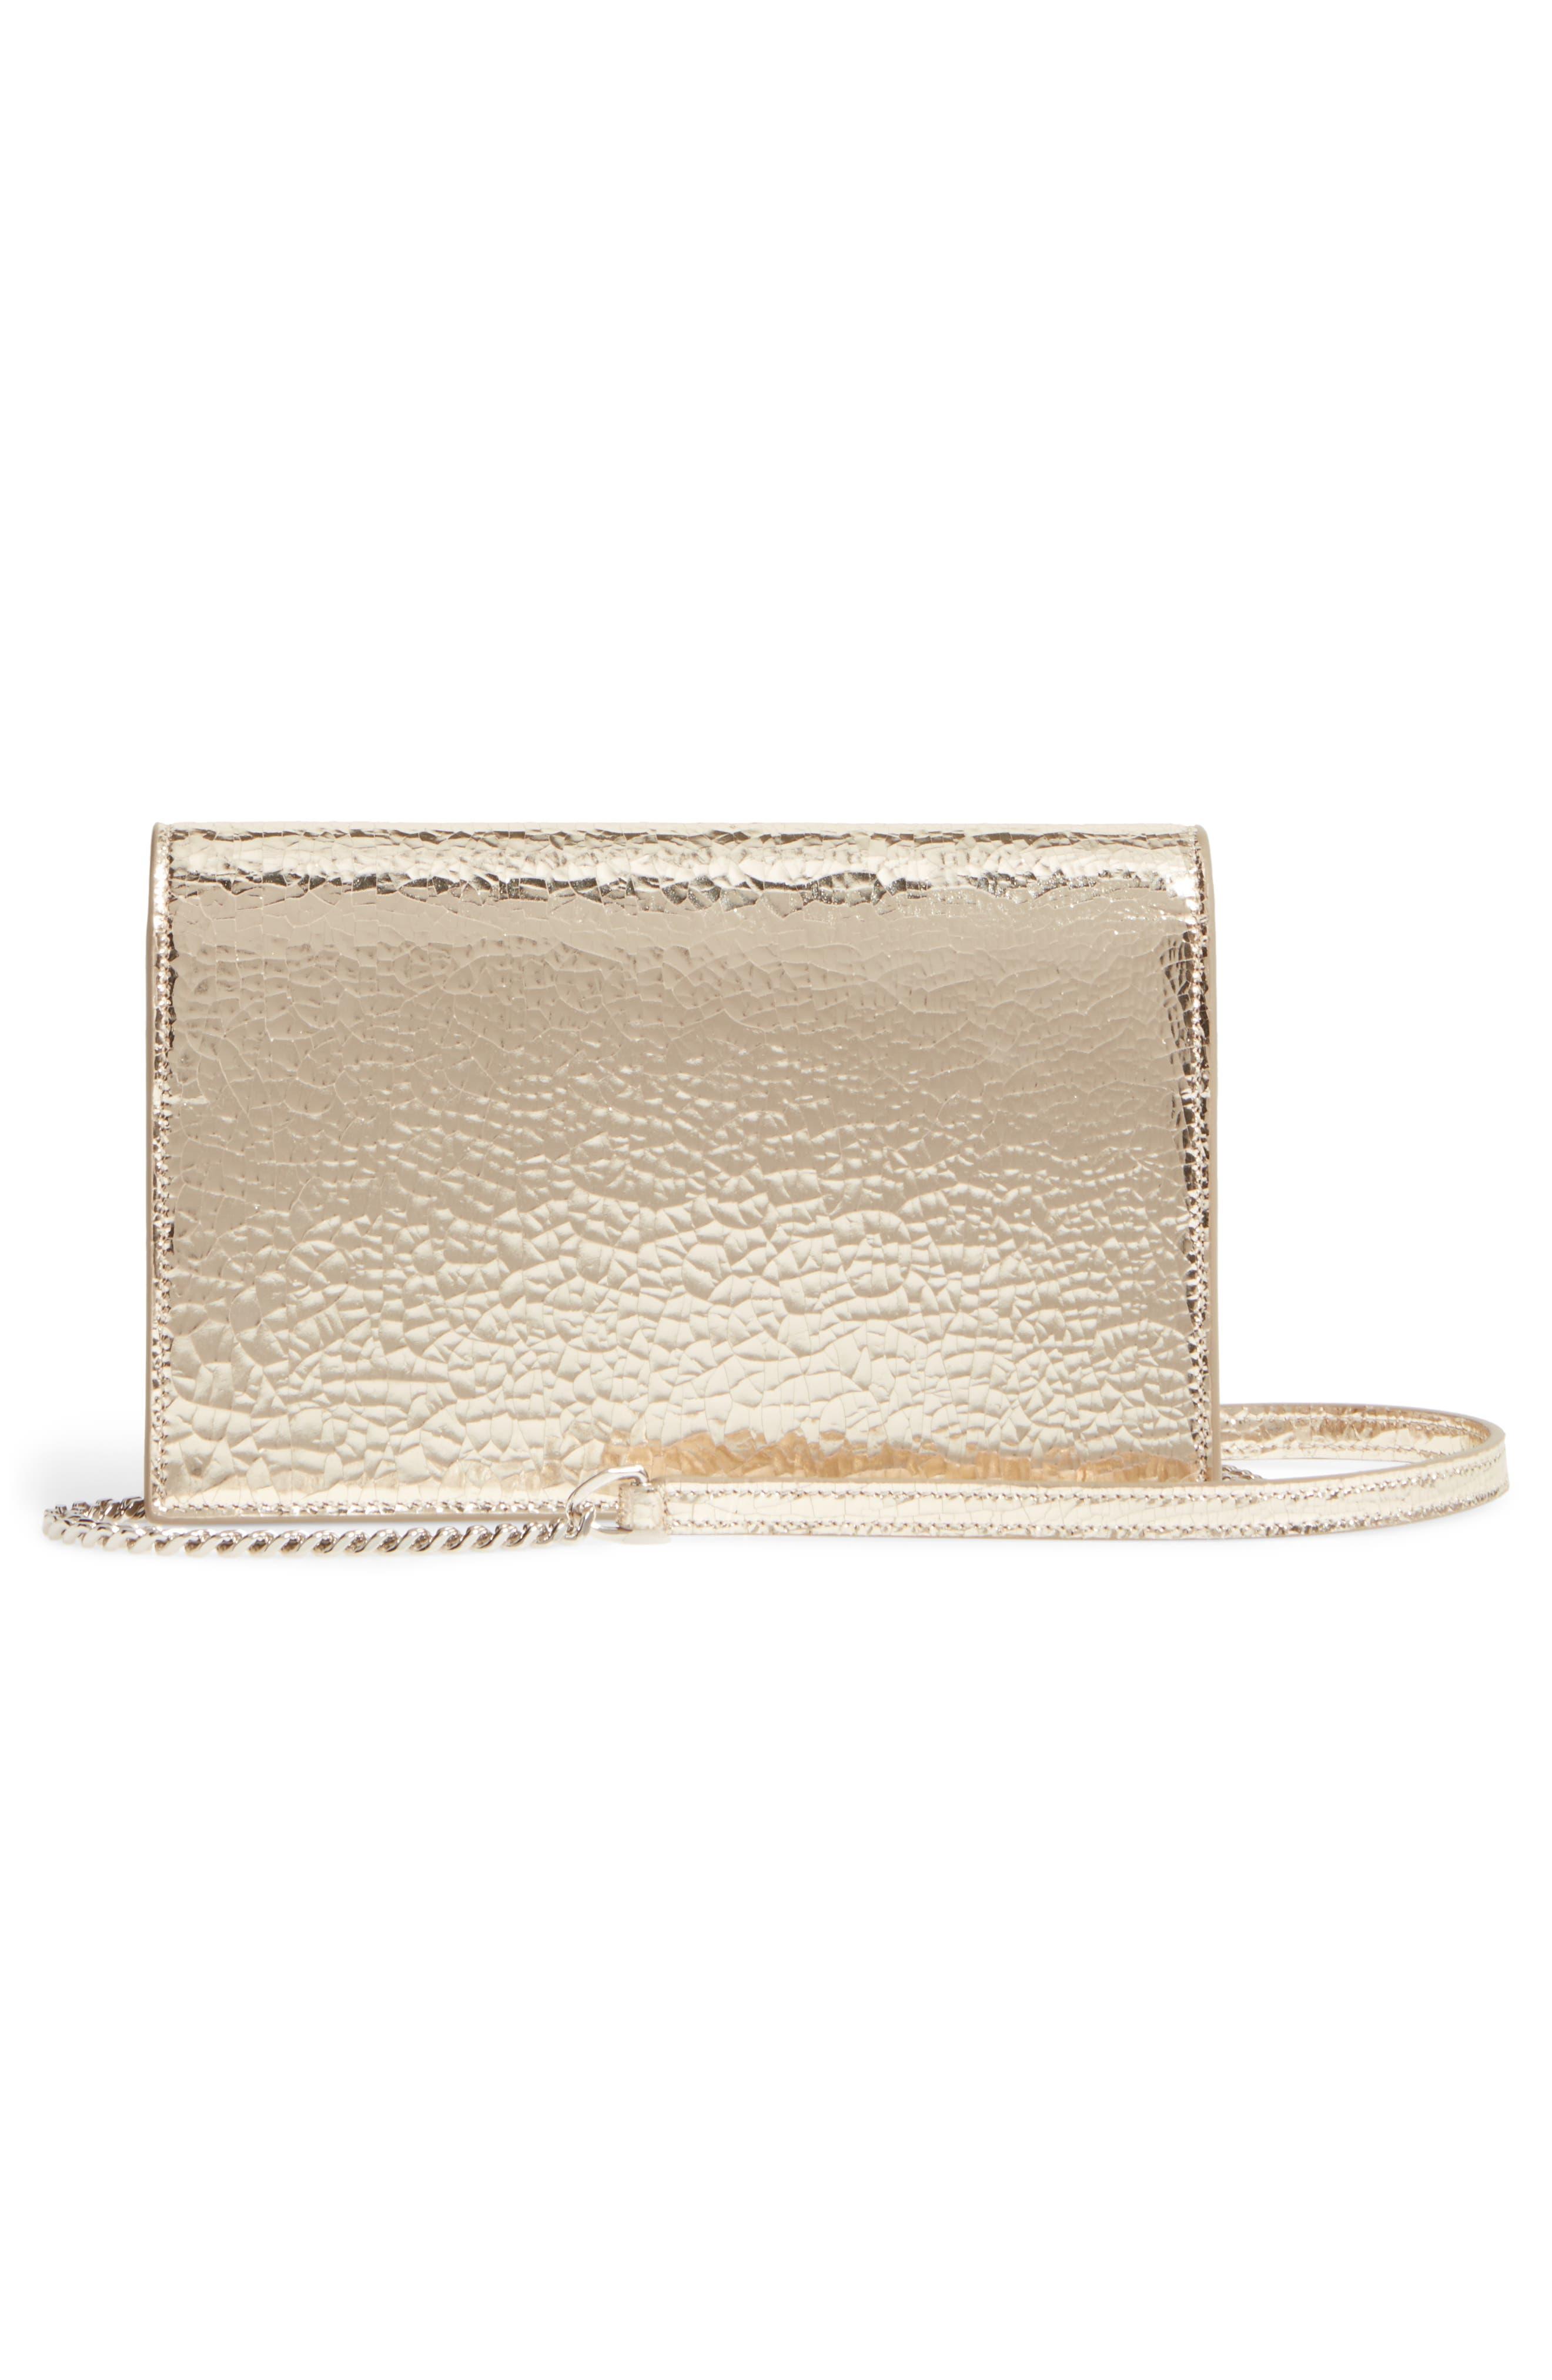 Alternate Image 3  - Saint Laurent Kate Crackle Calfskin Wallet on a Chain